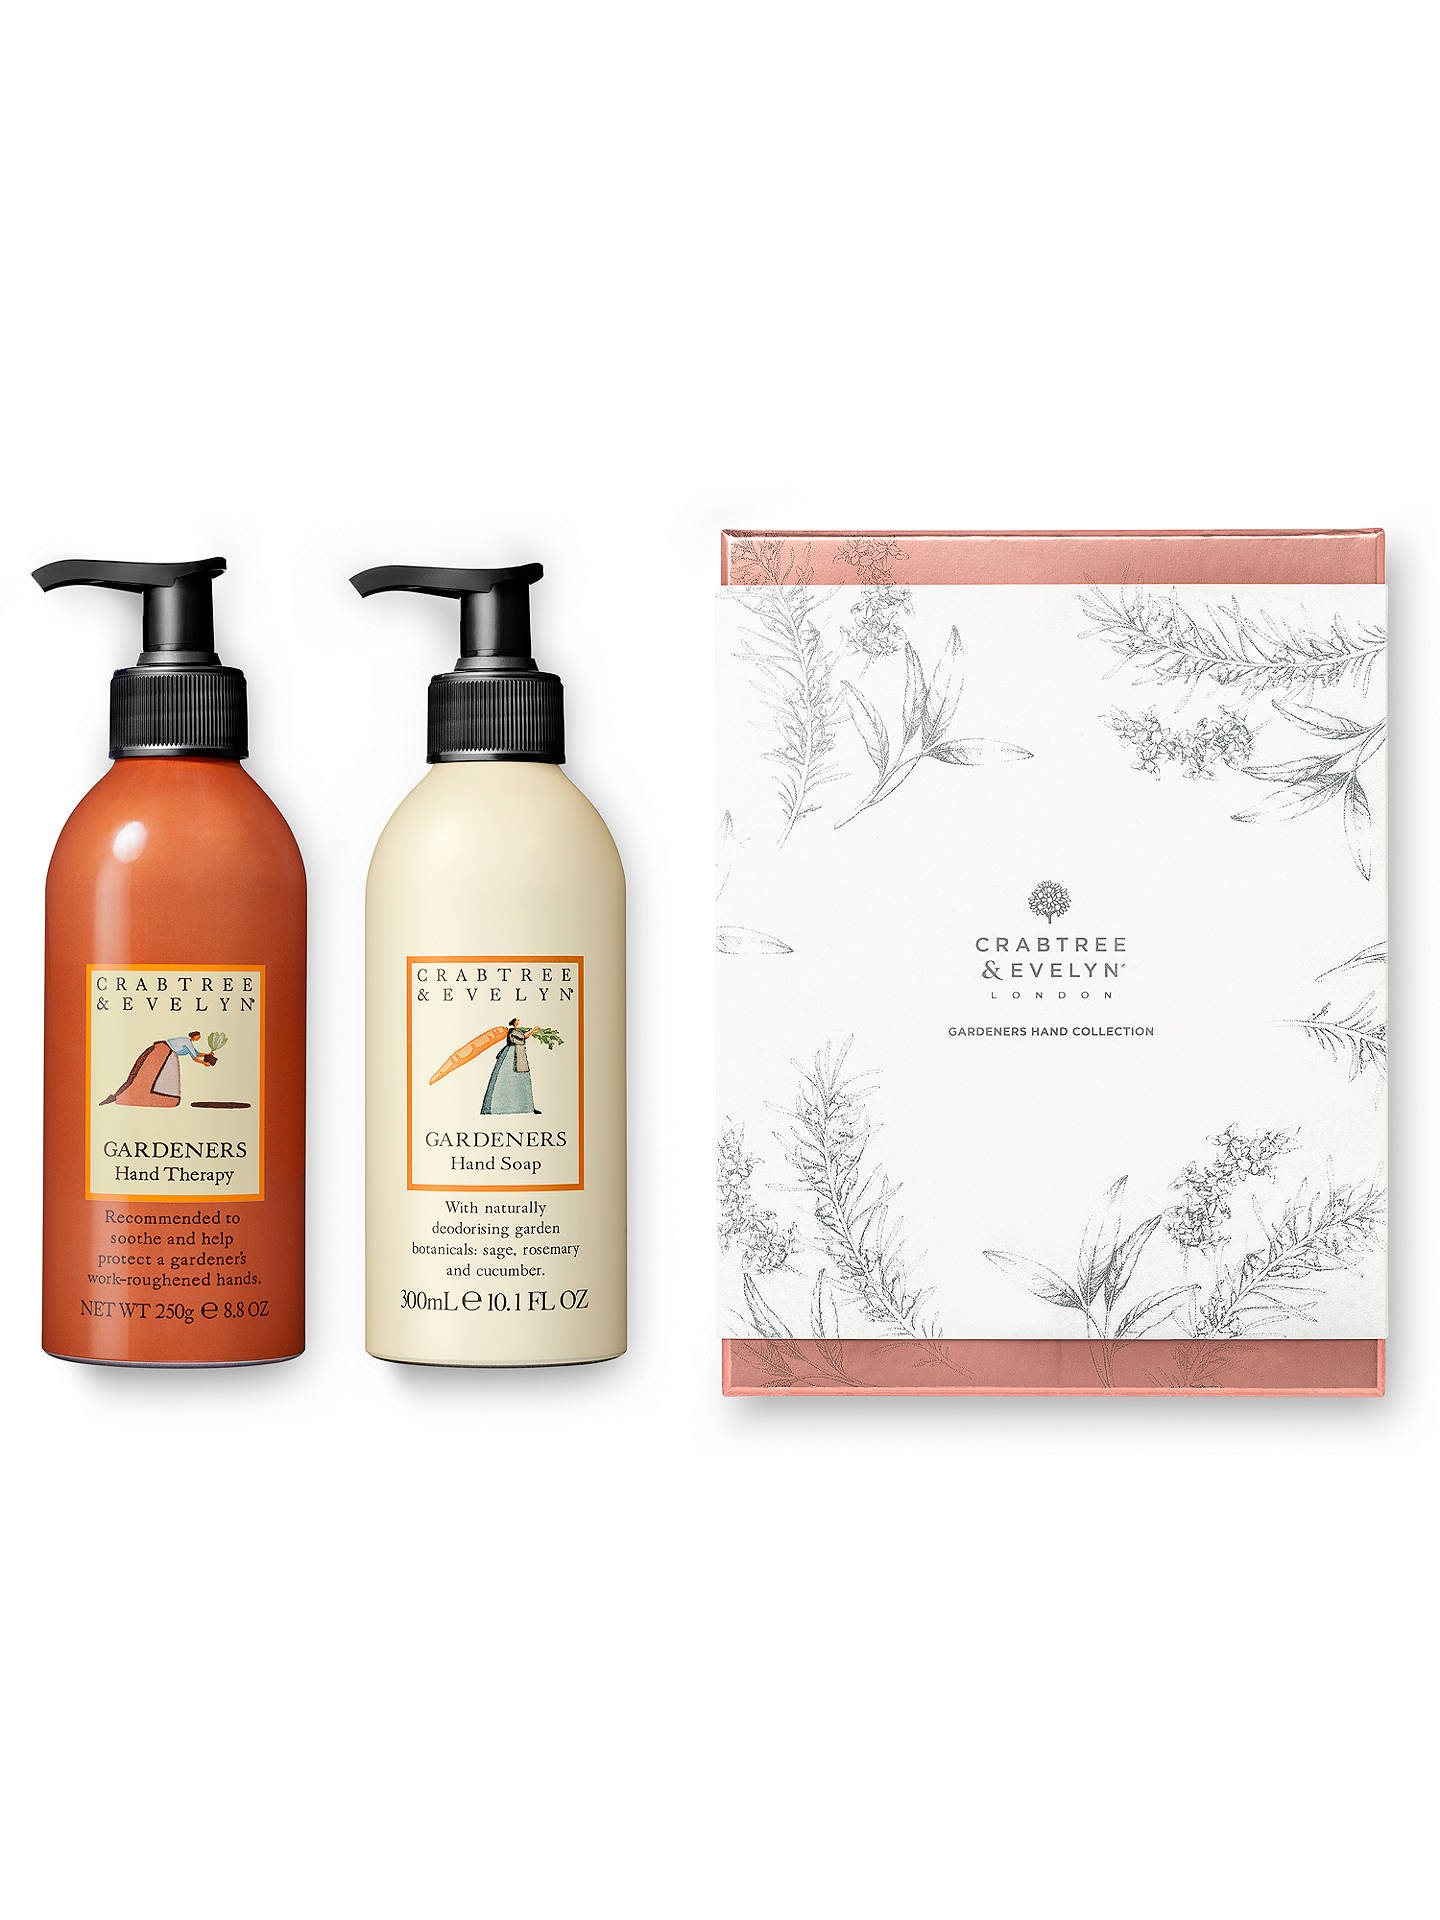 Crabtree & Evelyn Hand Cream set of 8